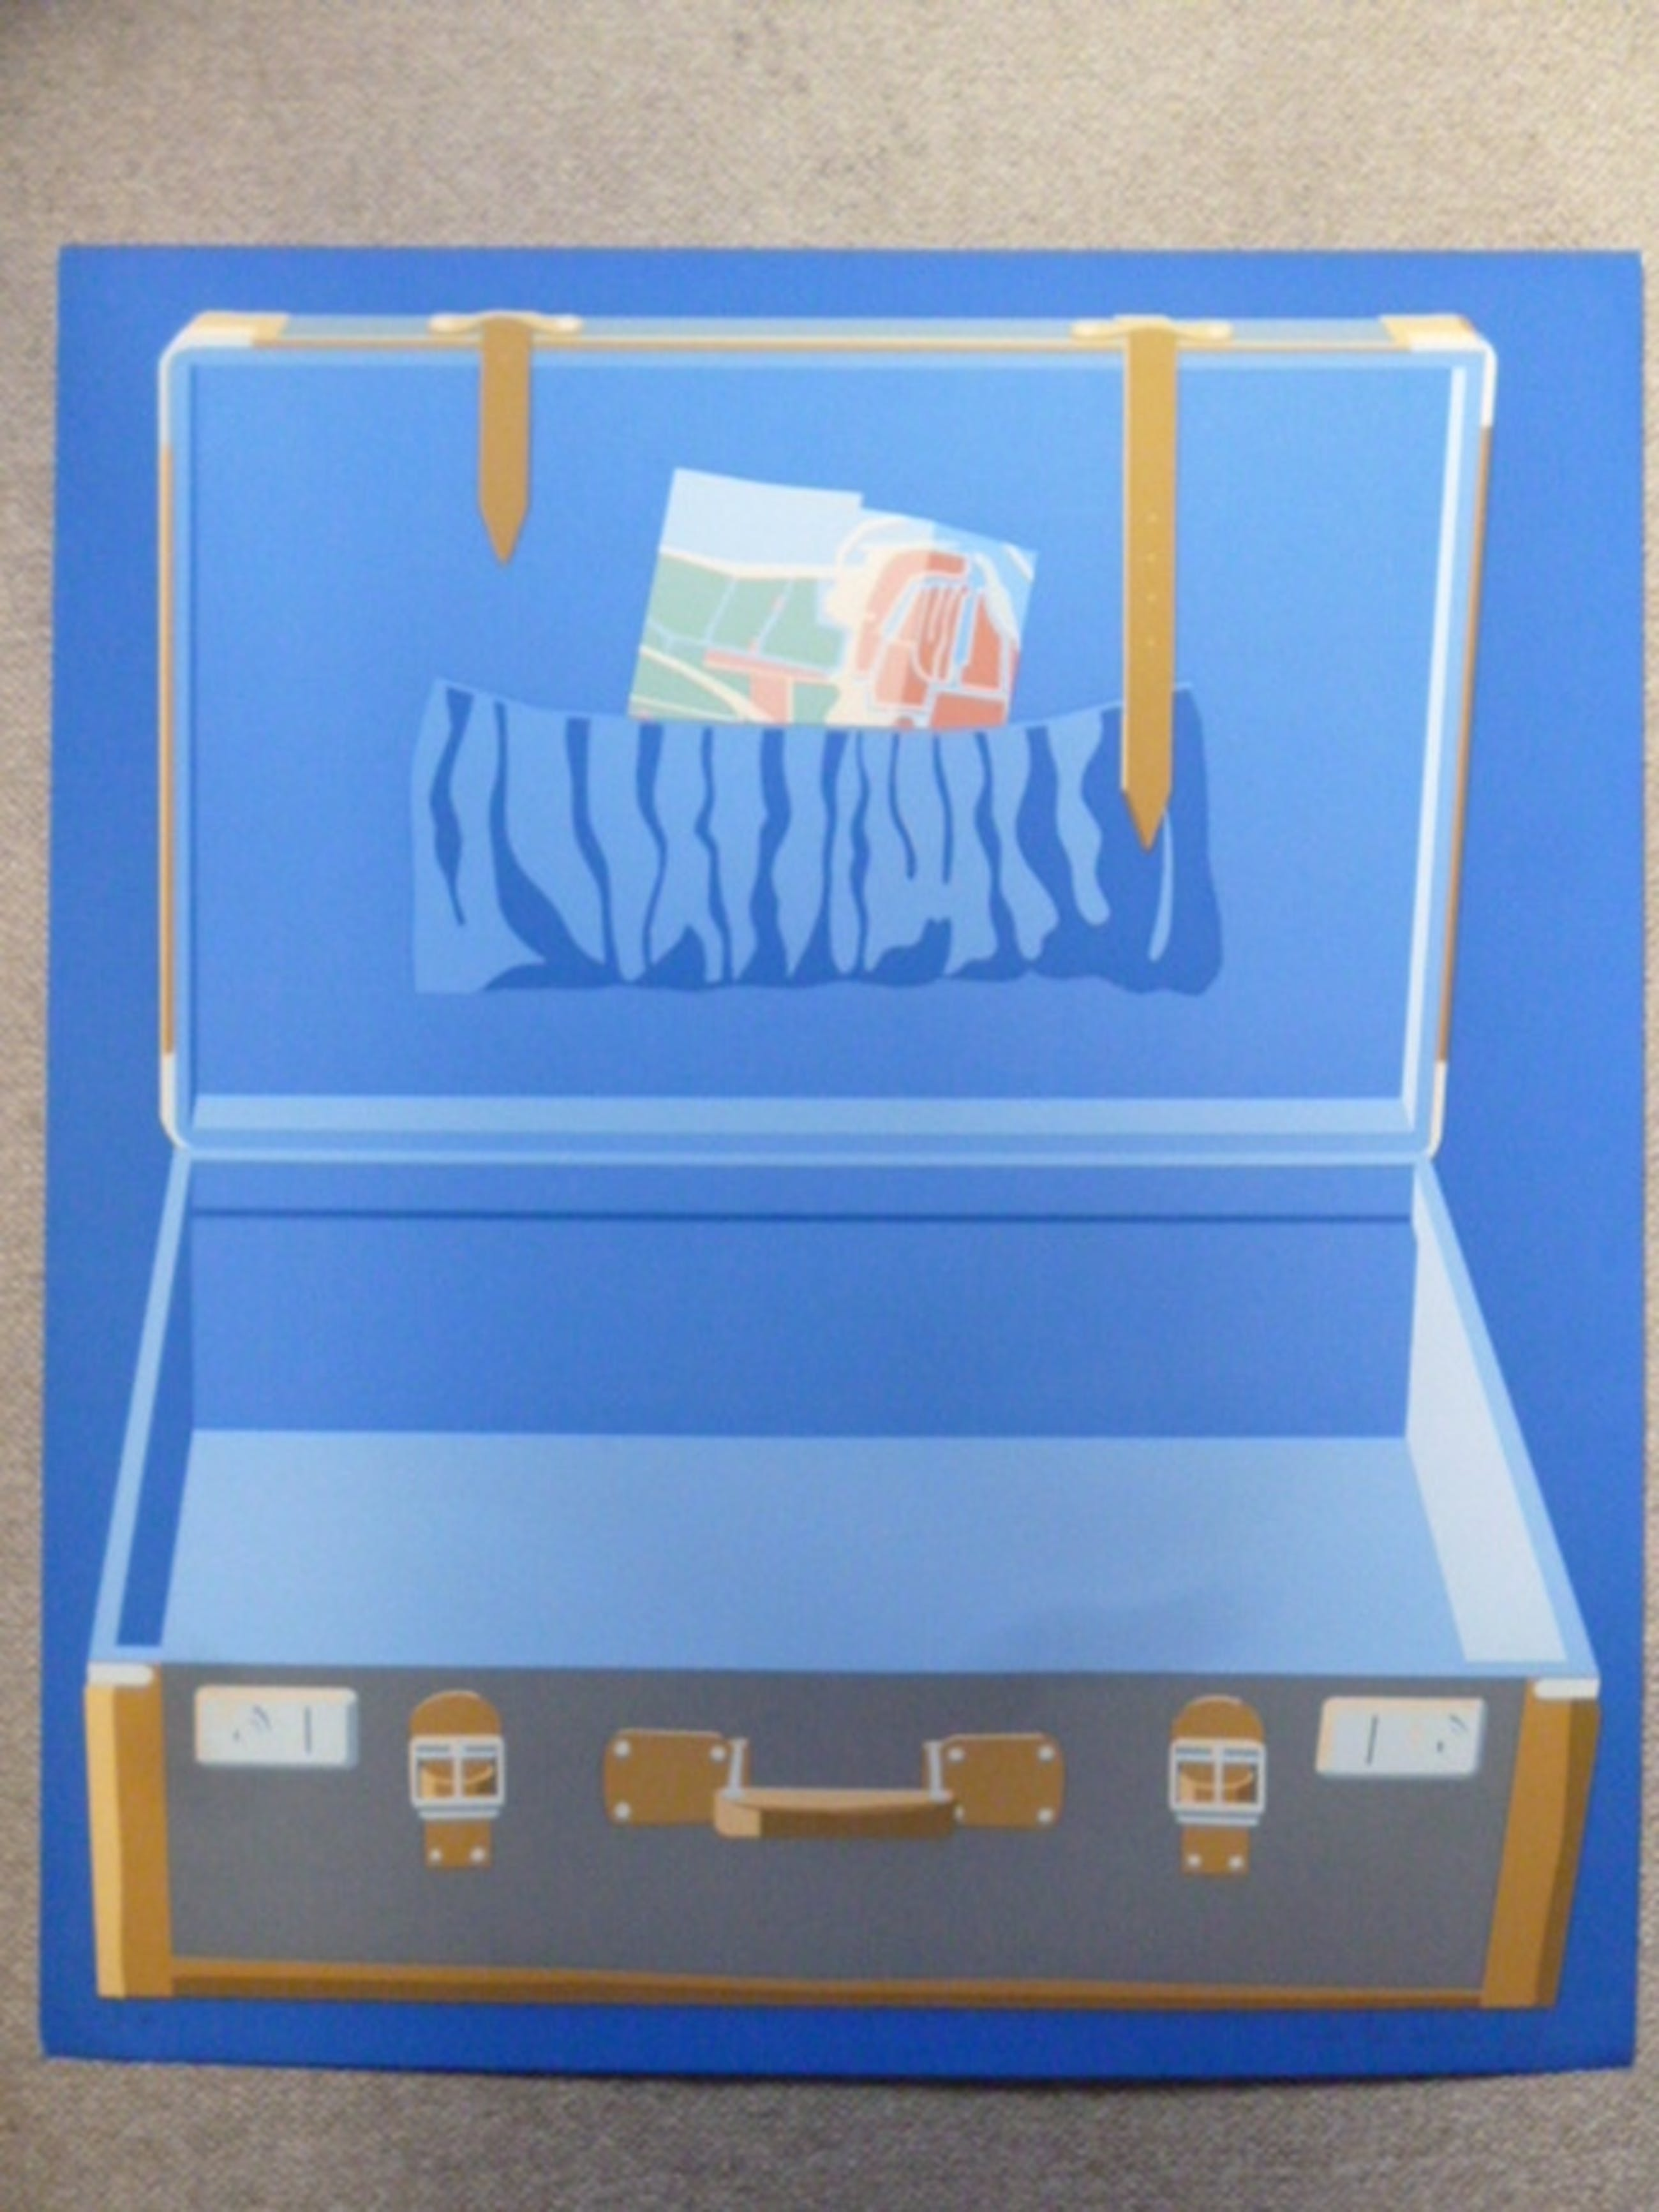 Lode Pemmelaar - kleurenlitho - Reiskoffer kopen? Bied vanaf 45!